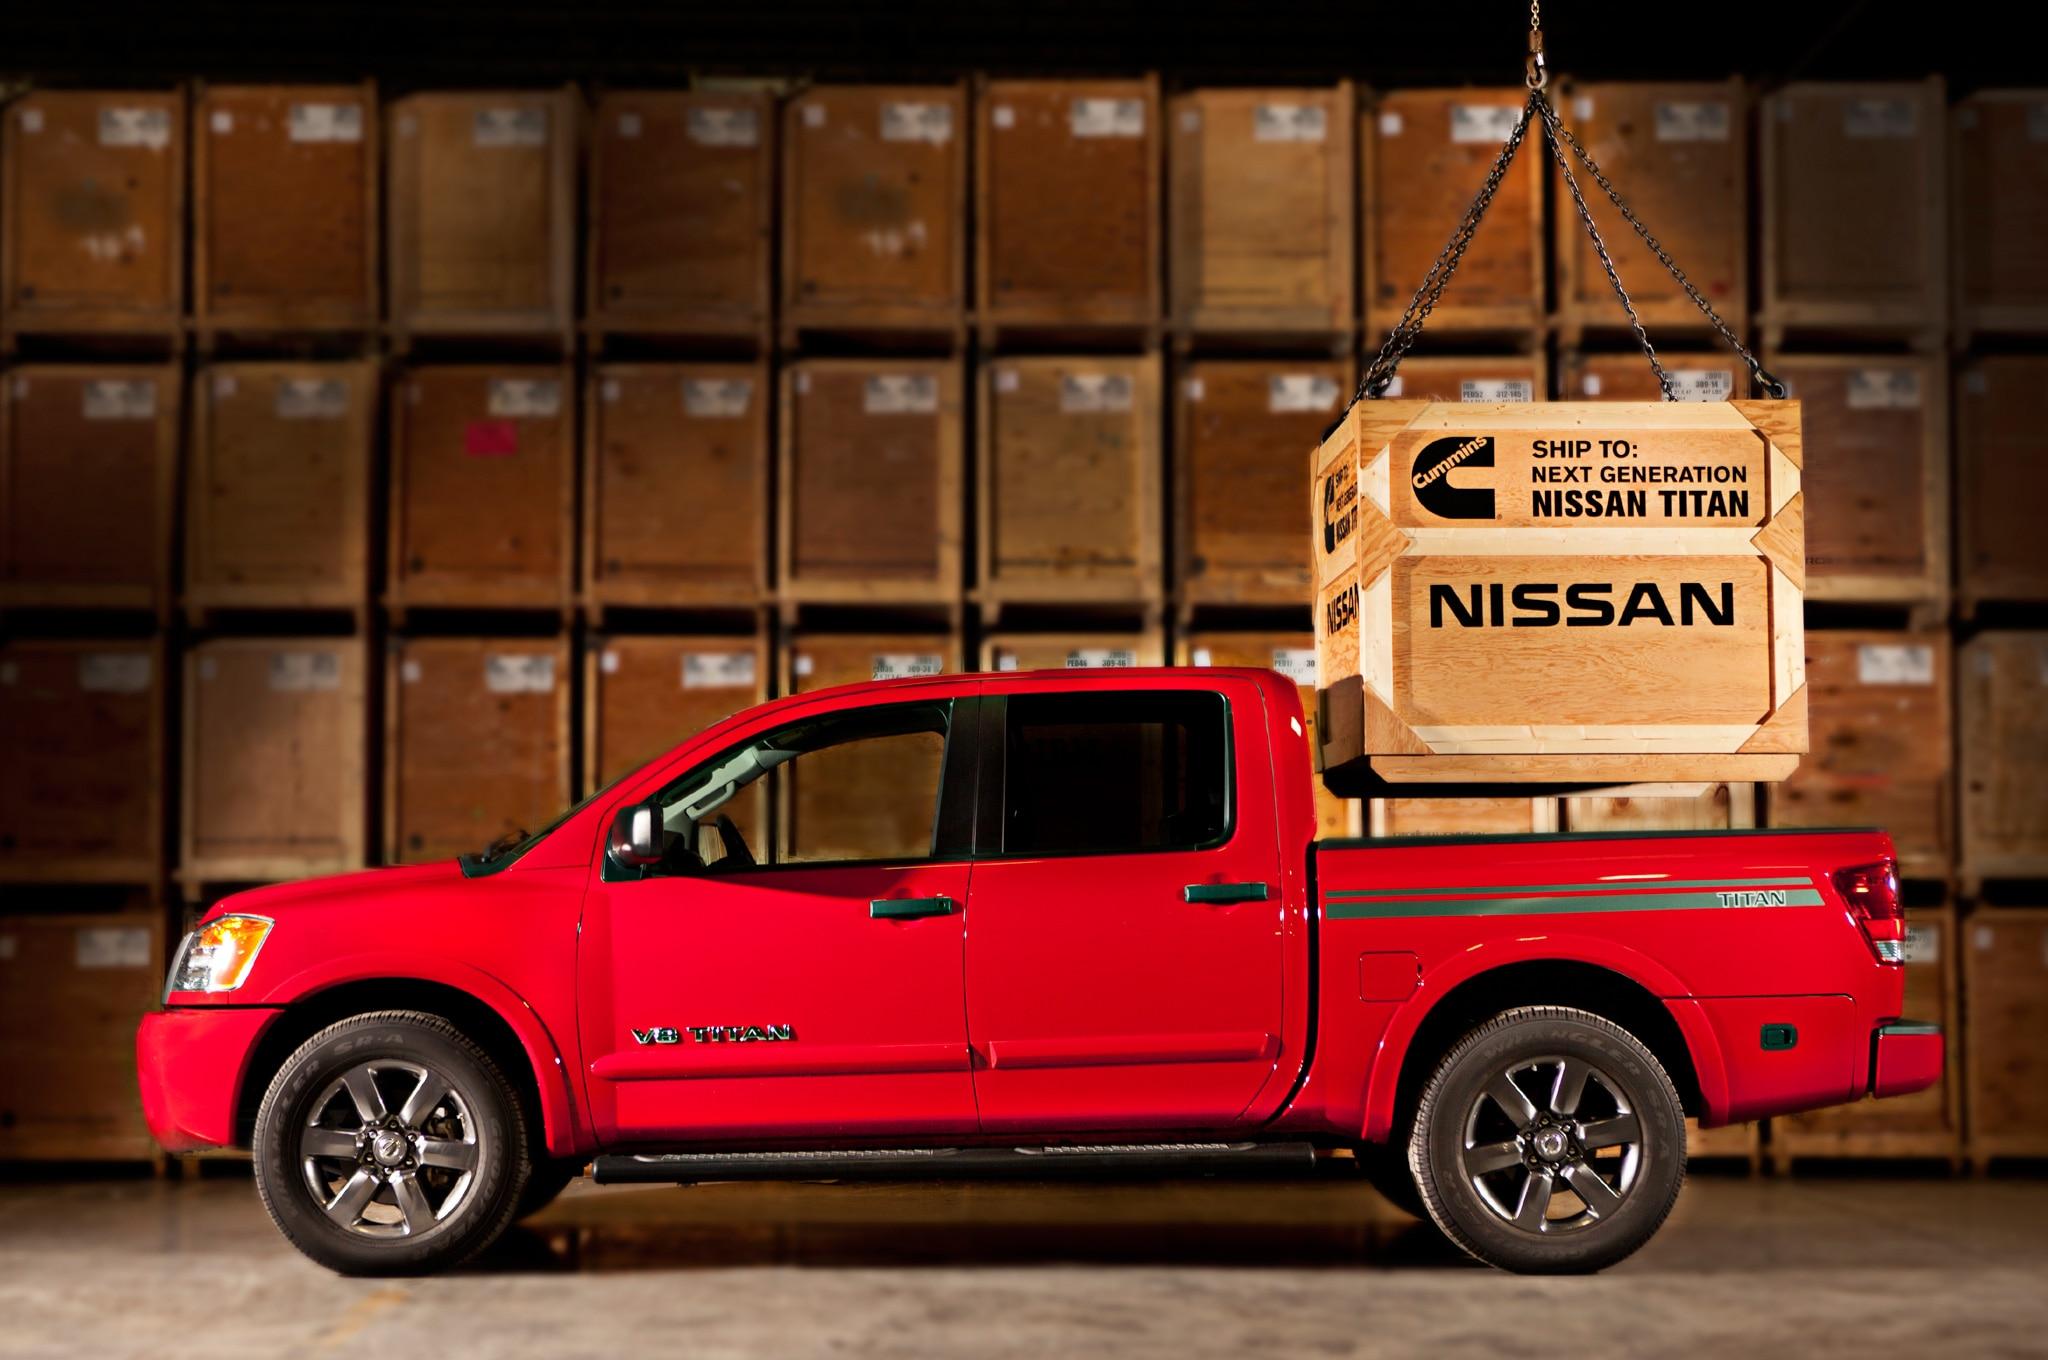 Nissan Titan Cummins Promo Image1